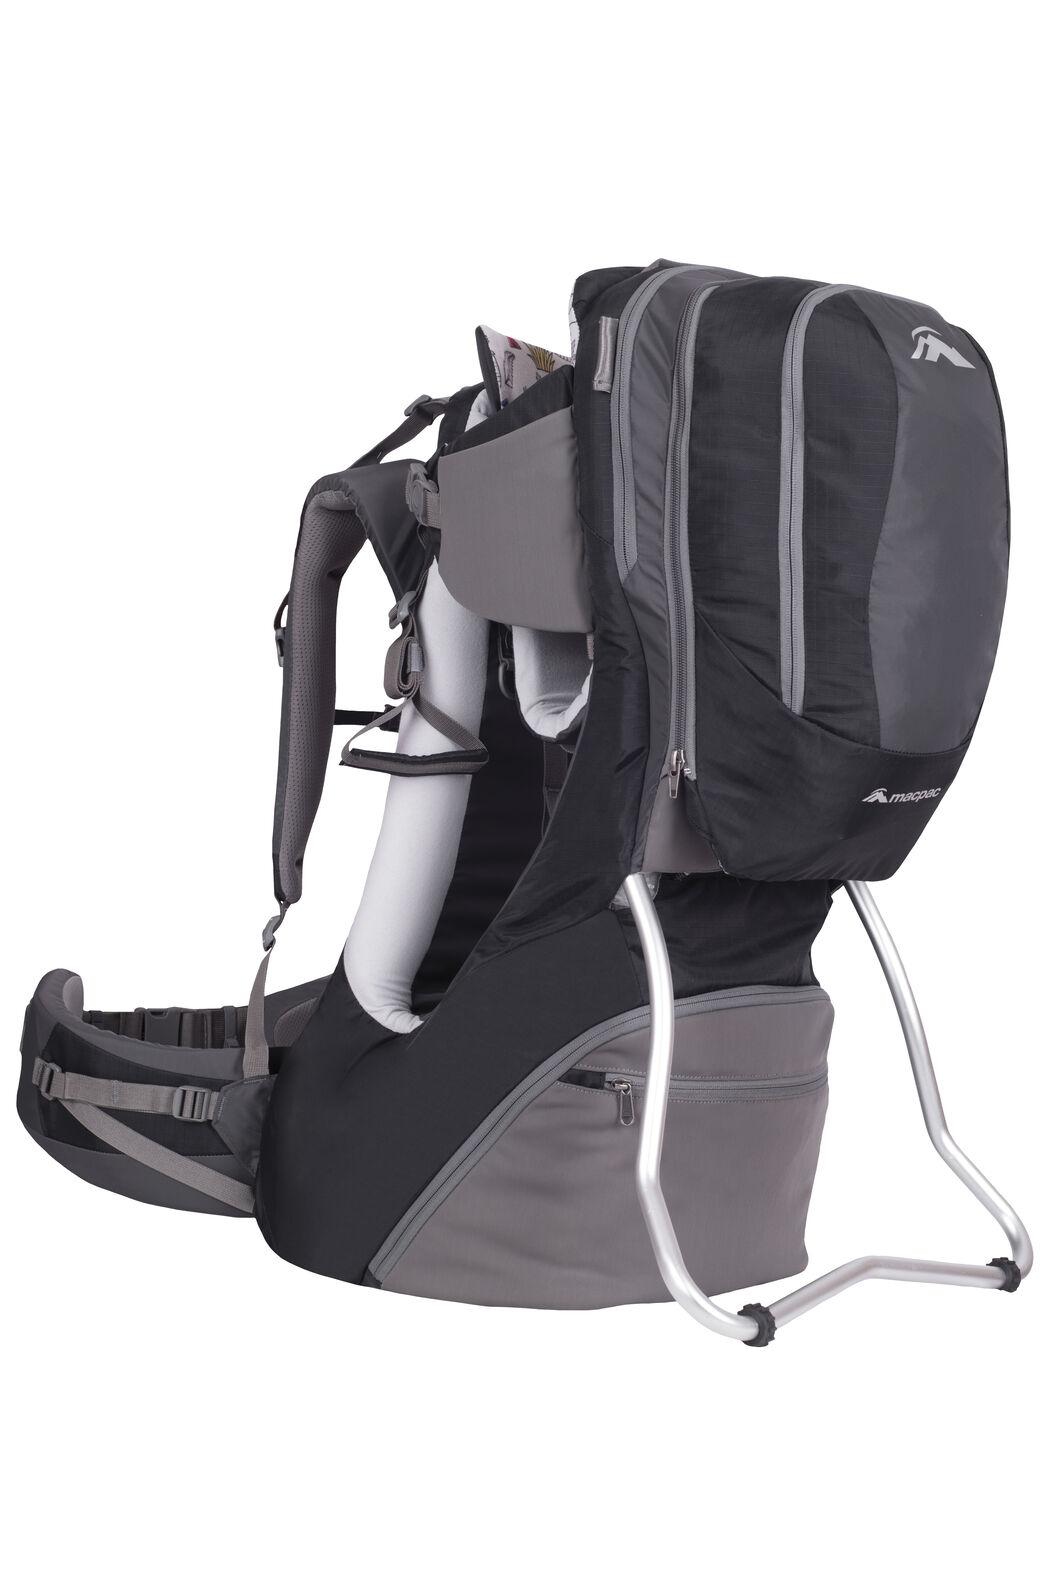 Macpac Vamoose Child Carrier, Black/Forged Iron, hi-res